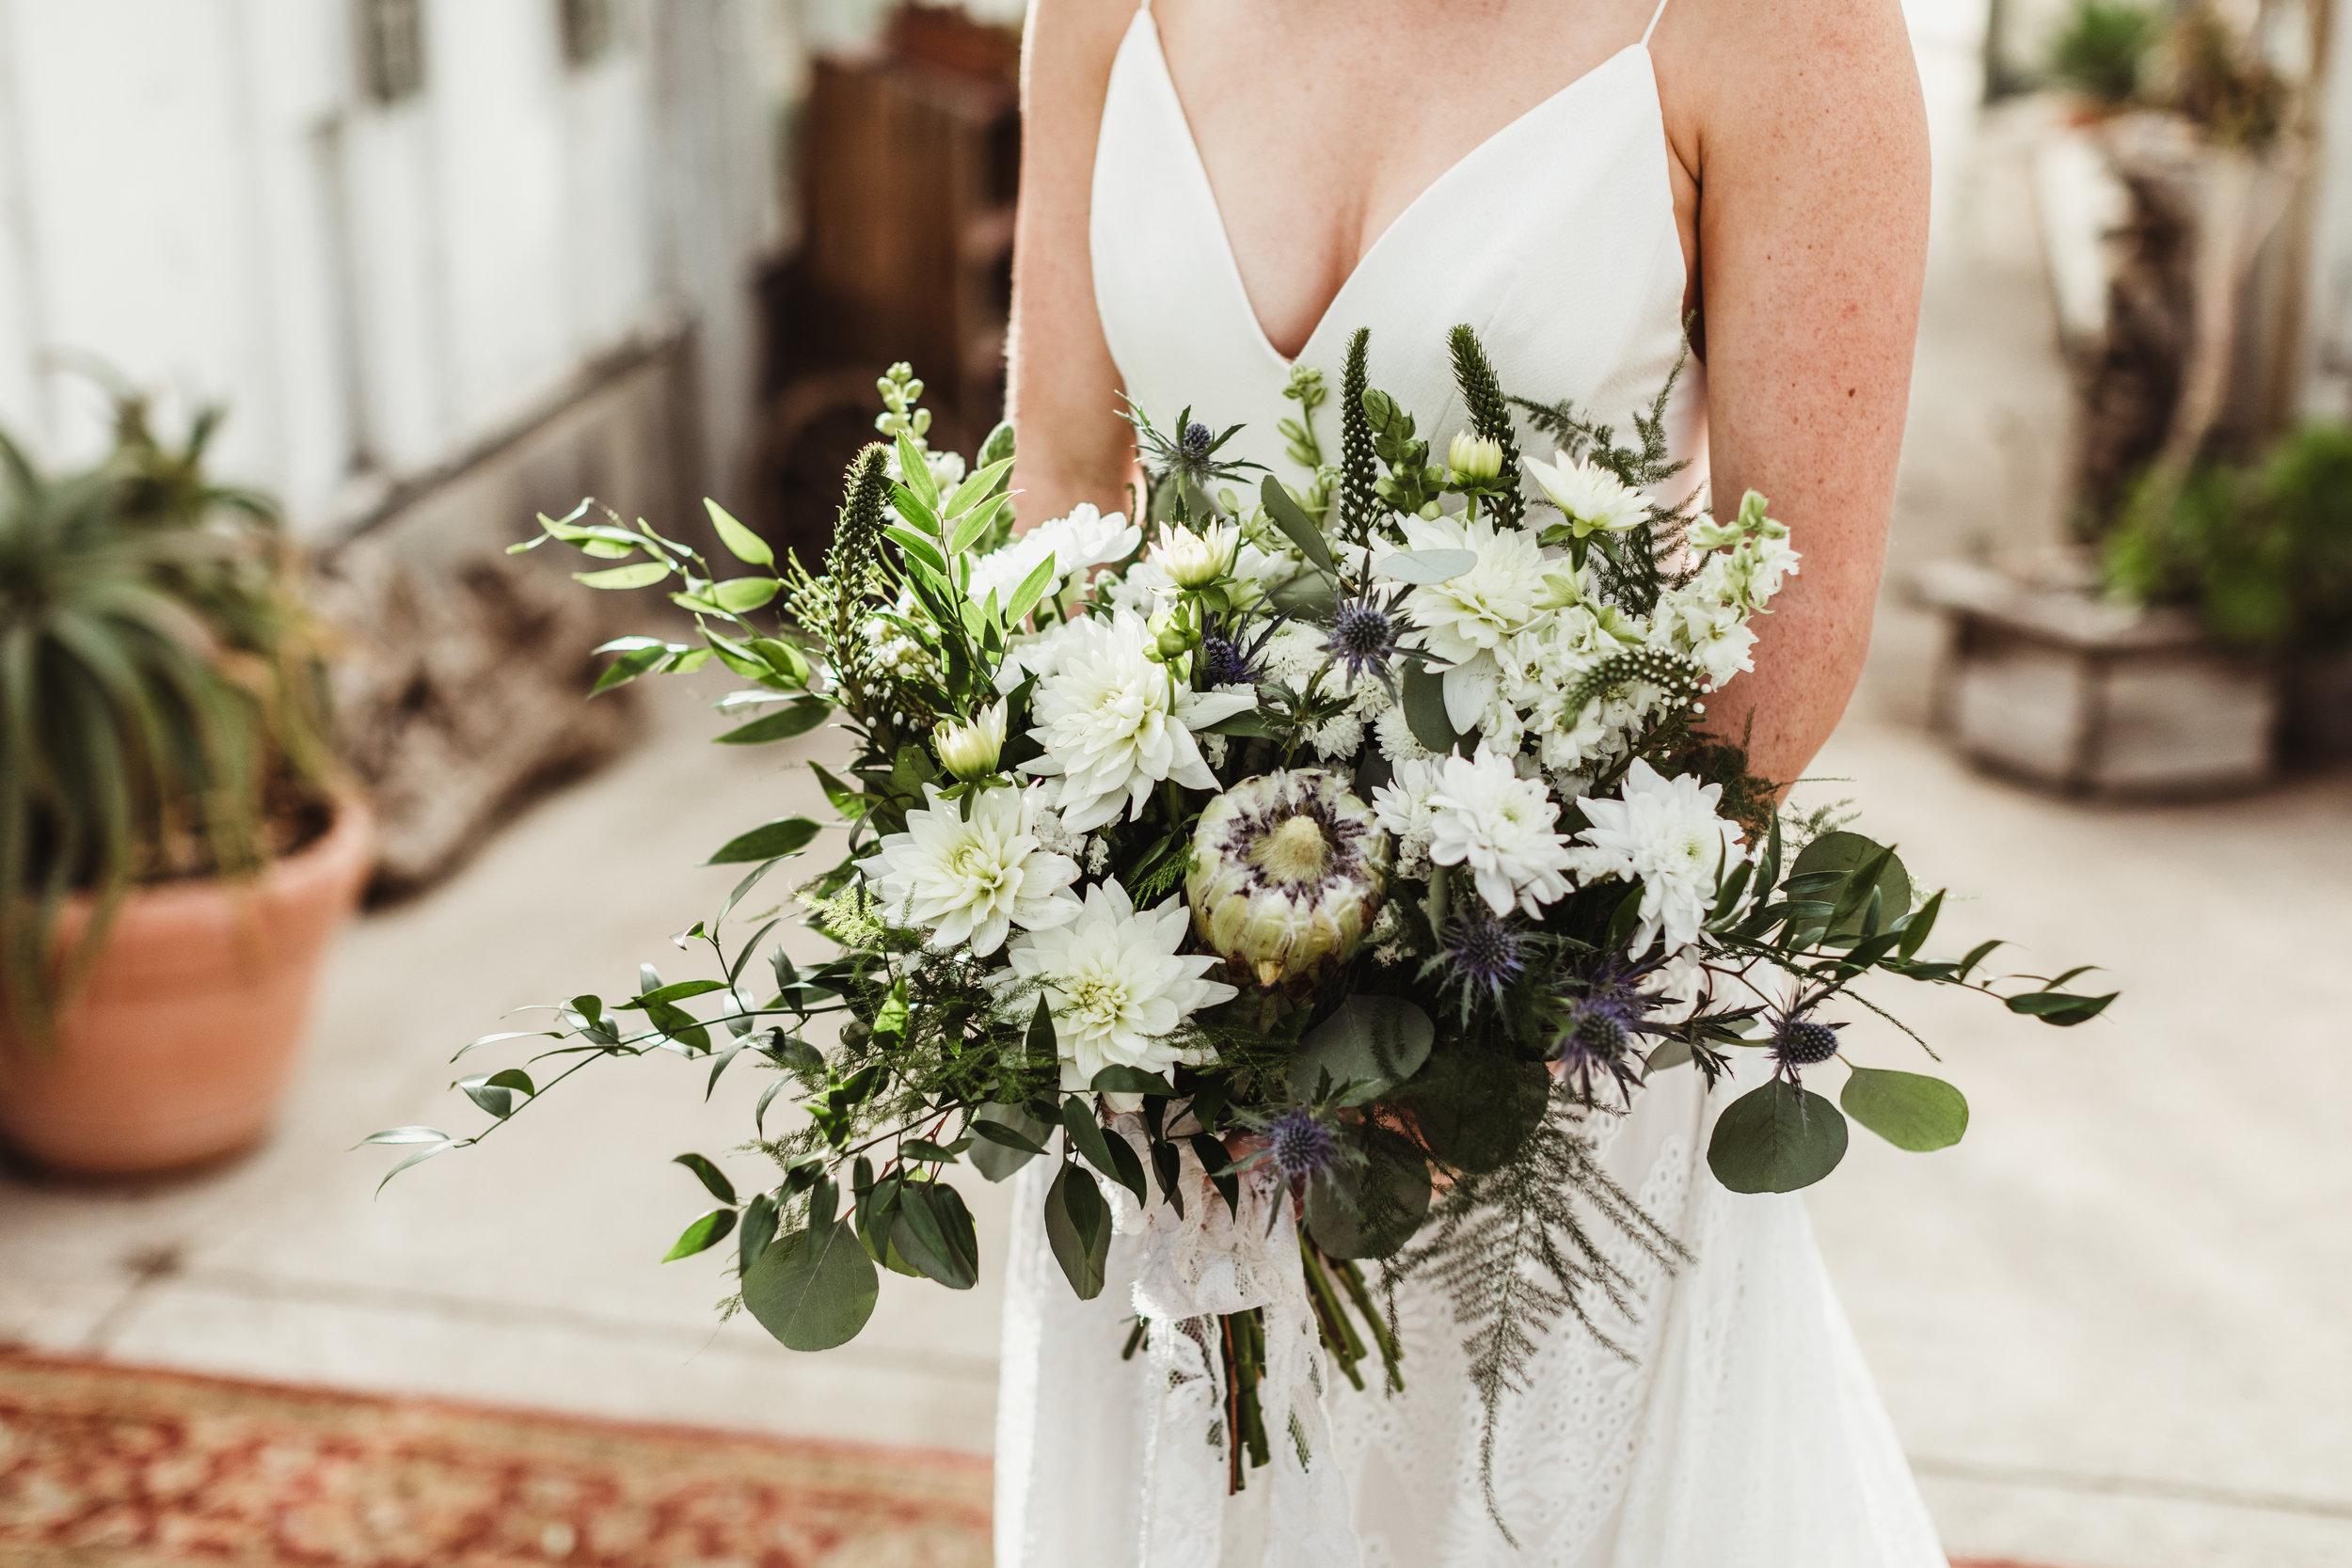 Jamie_English_Photography_JordanErik_Dos_Pueblos_Orchid_Wedding_Santa_Barbara_Fall2018-225.jpg